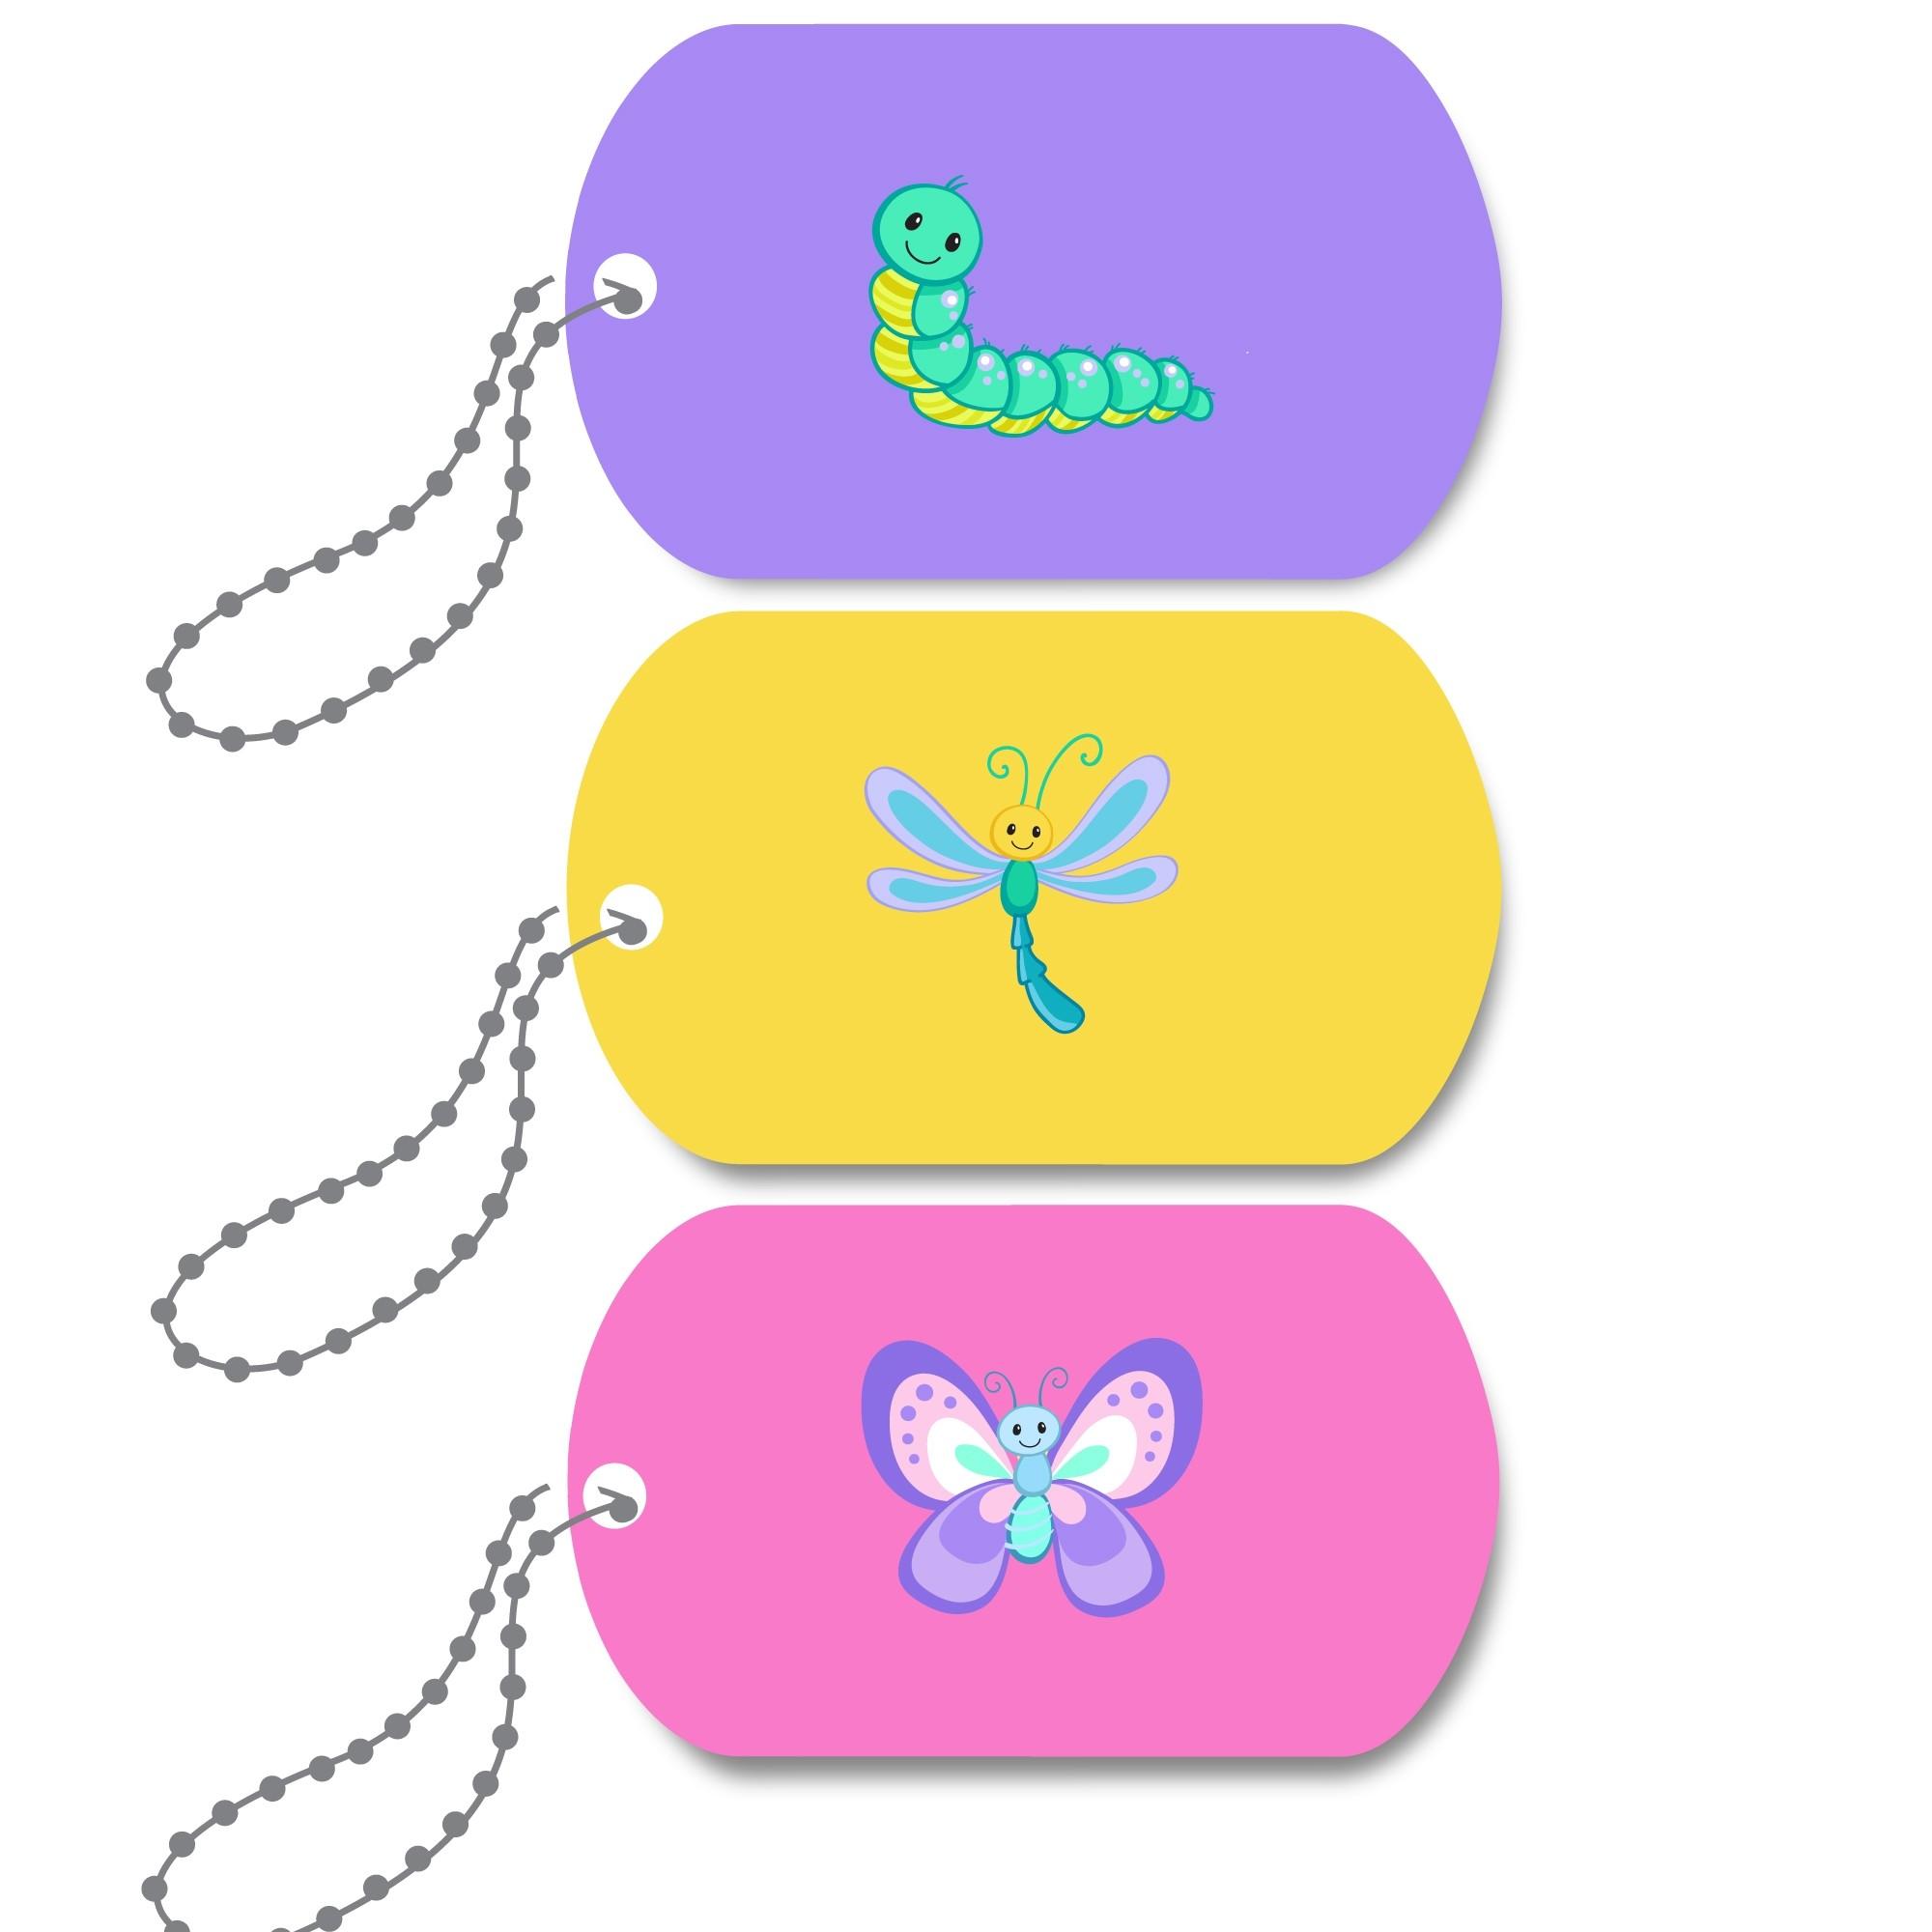 b6fff0720af3 MINITAG-BRIGHTBUG Mini-Metal Tags - Bright Bugs